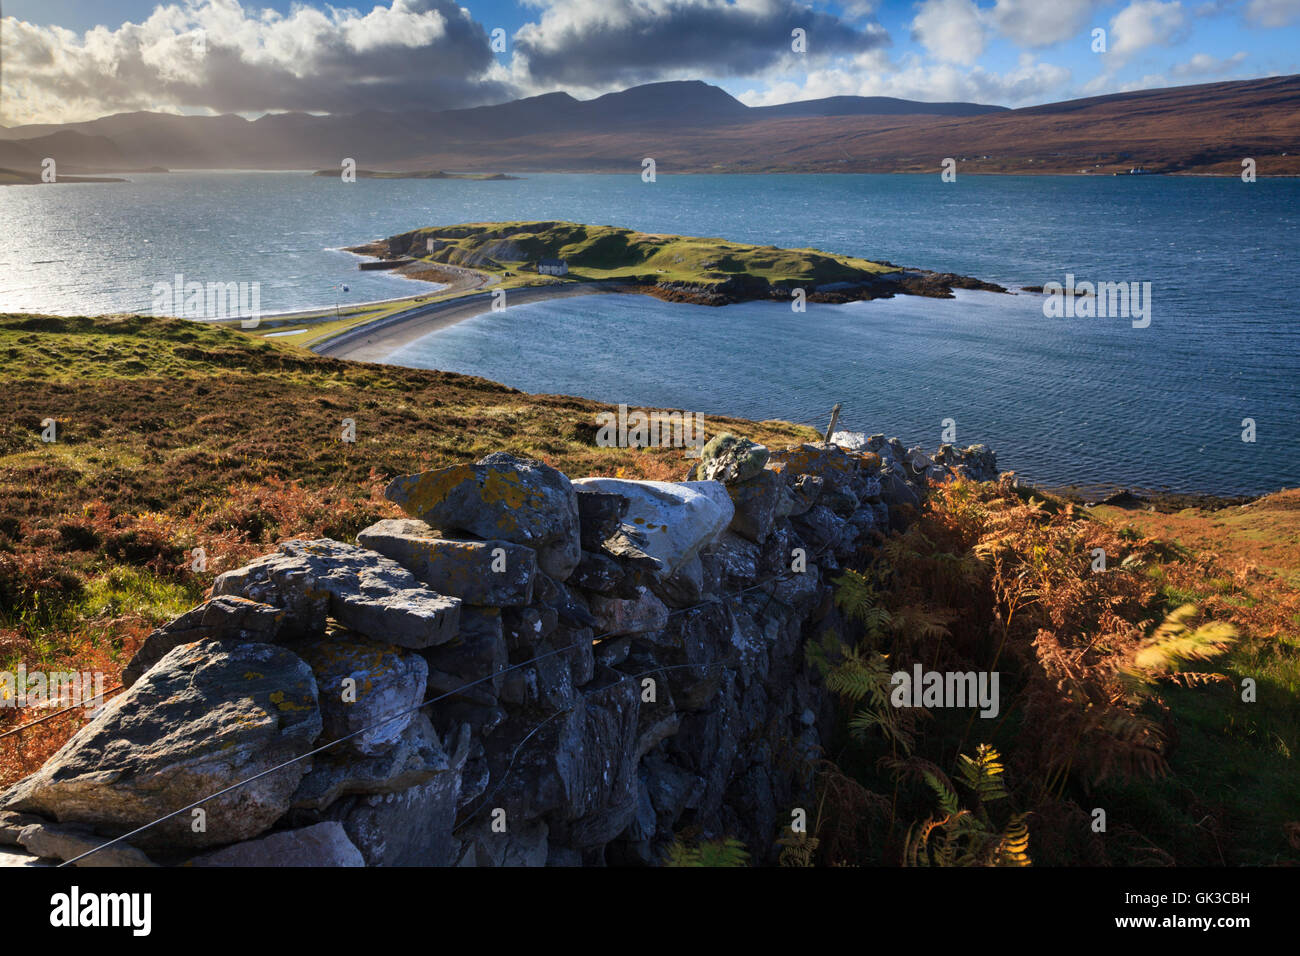 Loch Eriboll in North West Scotland - Stock Image